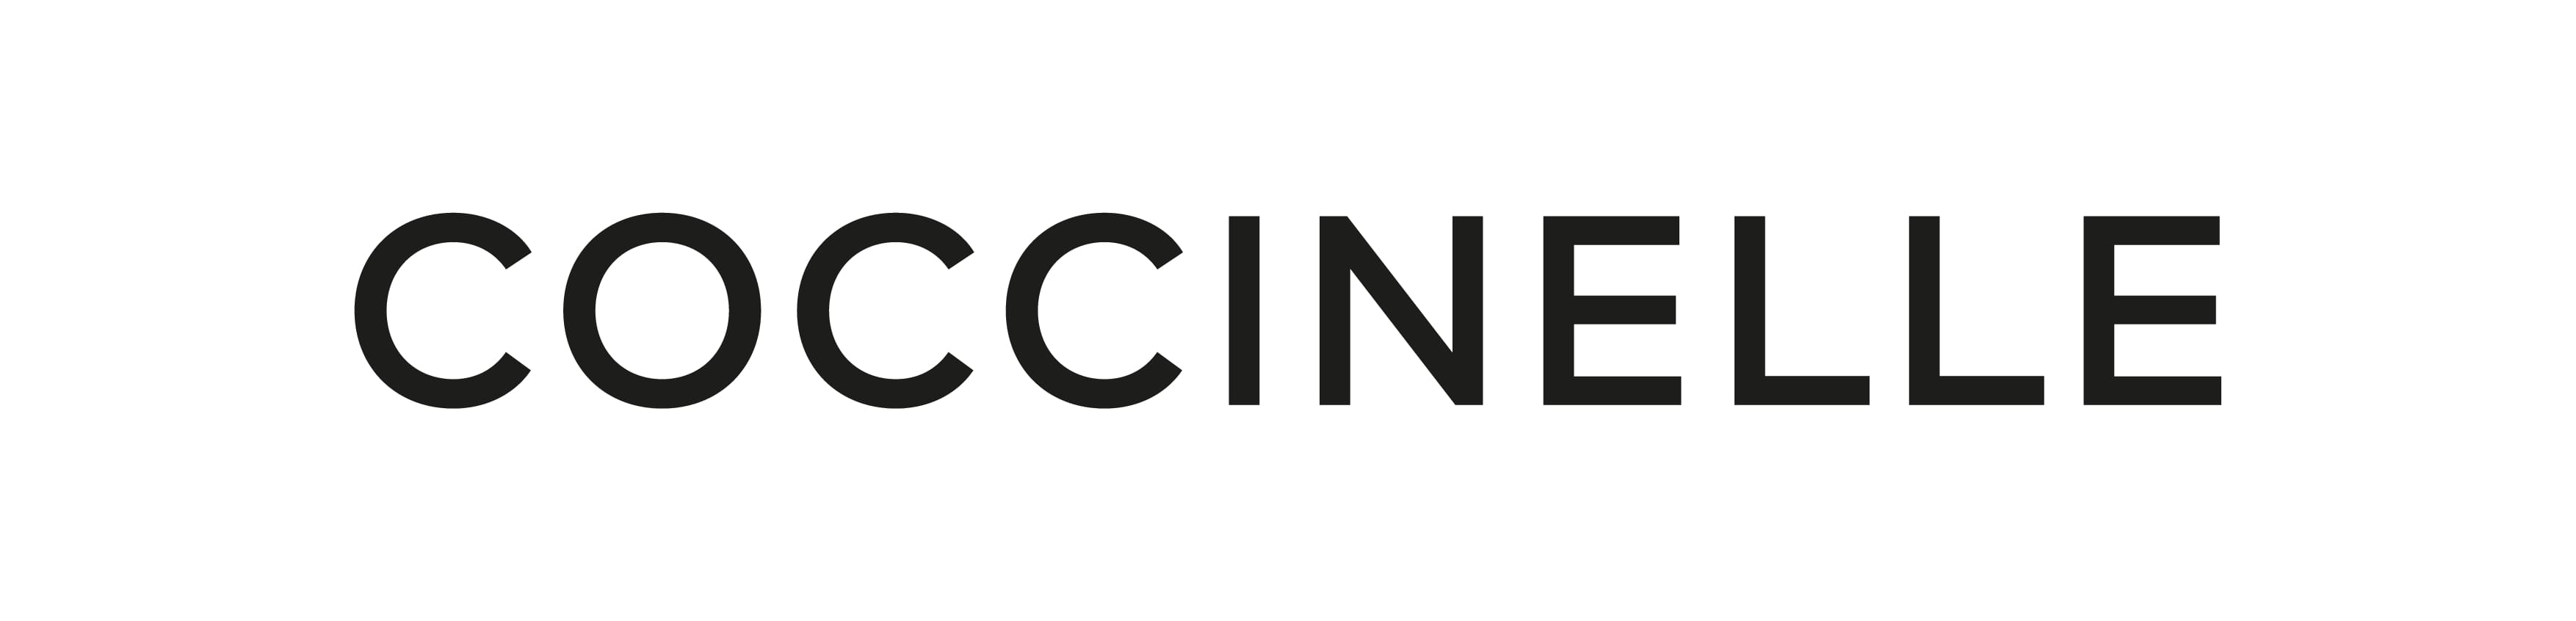 COCCINELLE-Logo